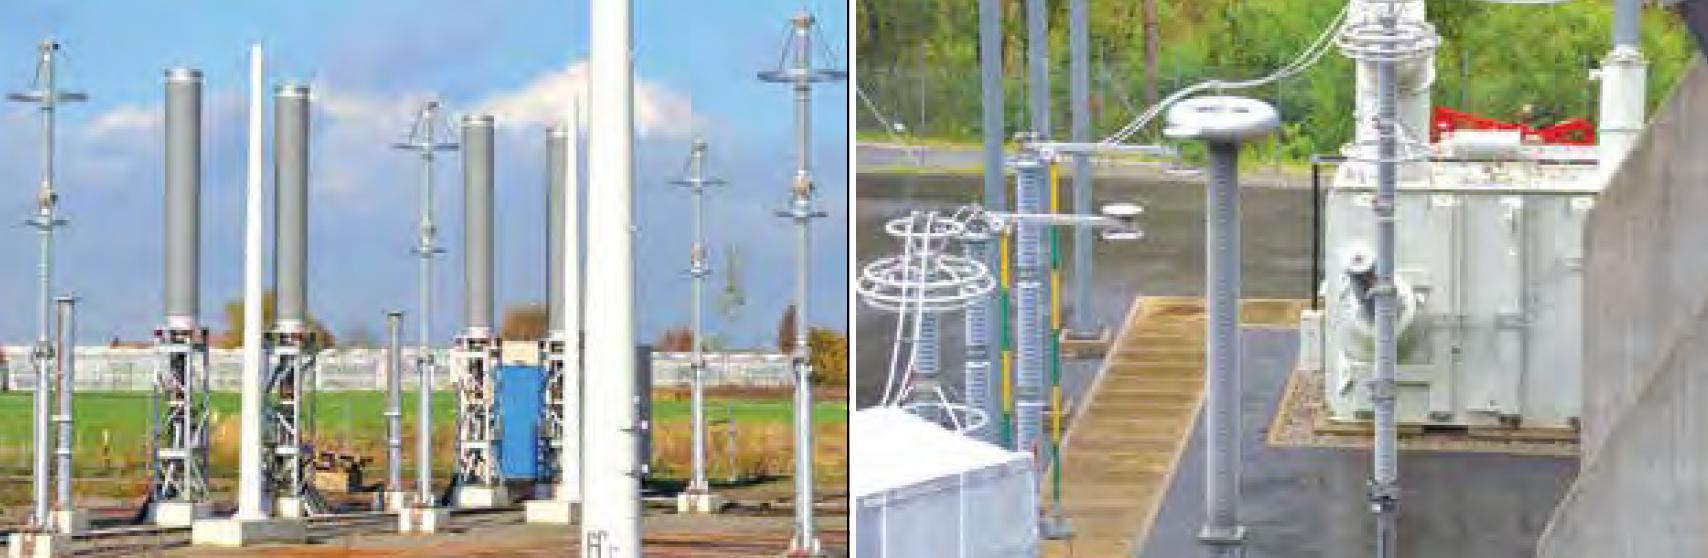 HV Arrester Development of Station Class/HV Arrester Technology Screen Shot 2018 09 28 at 18